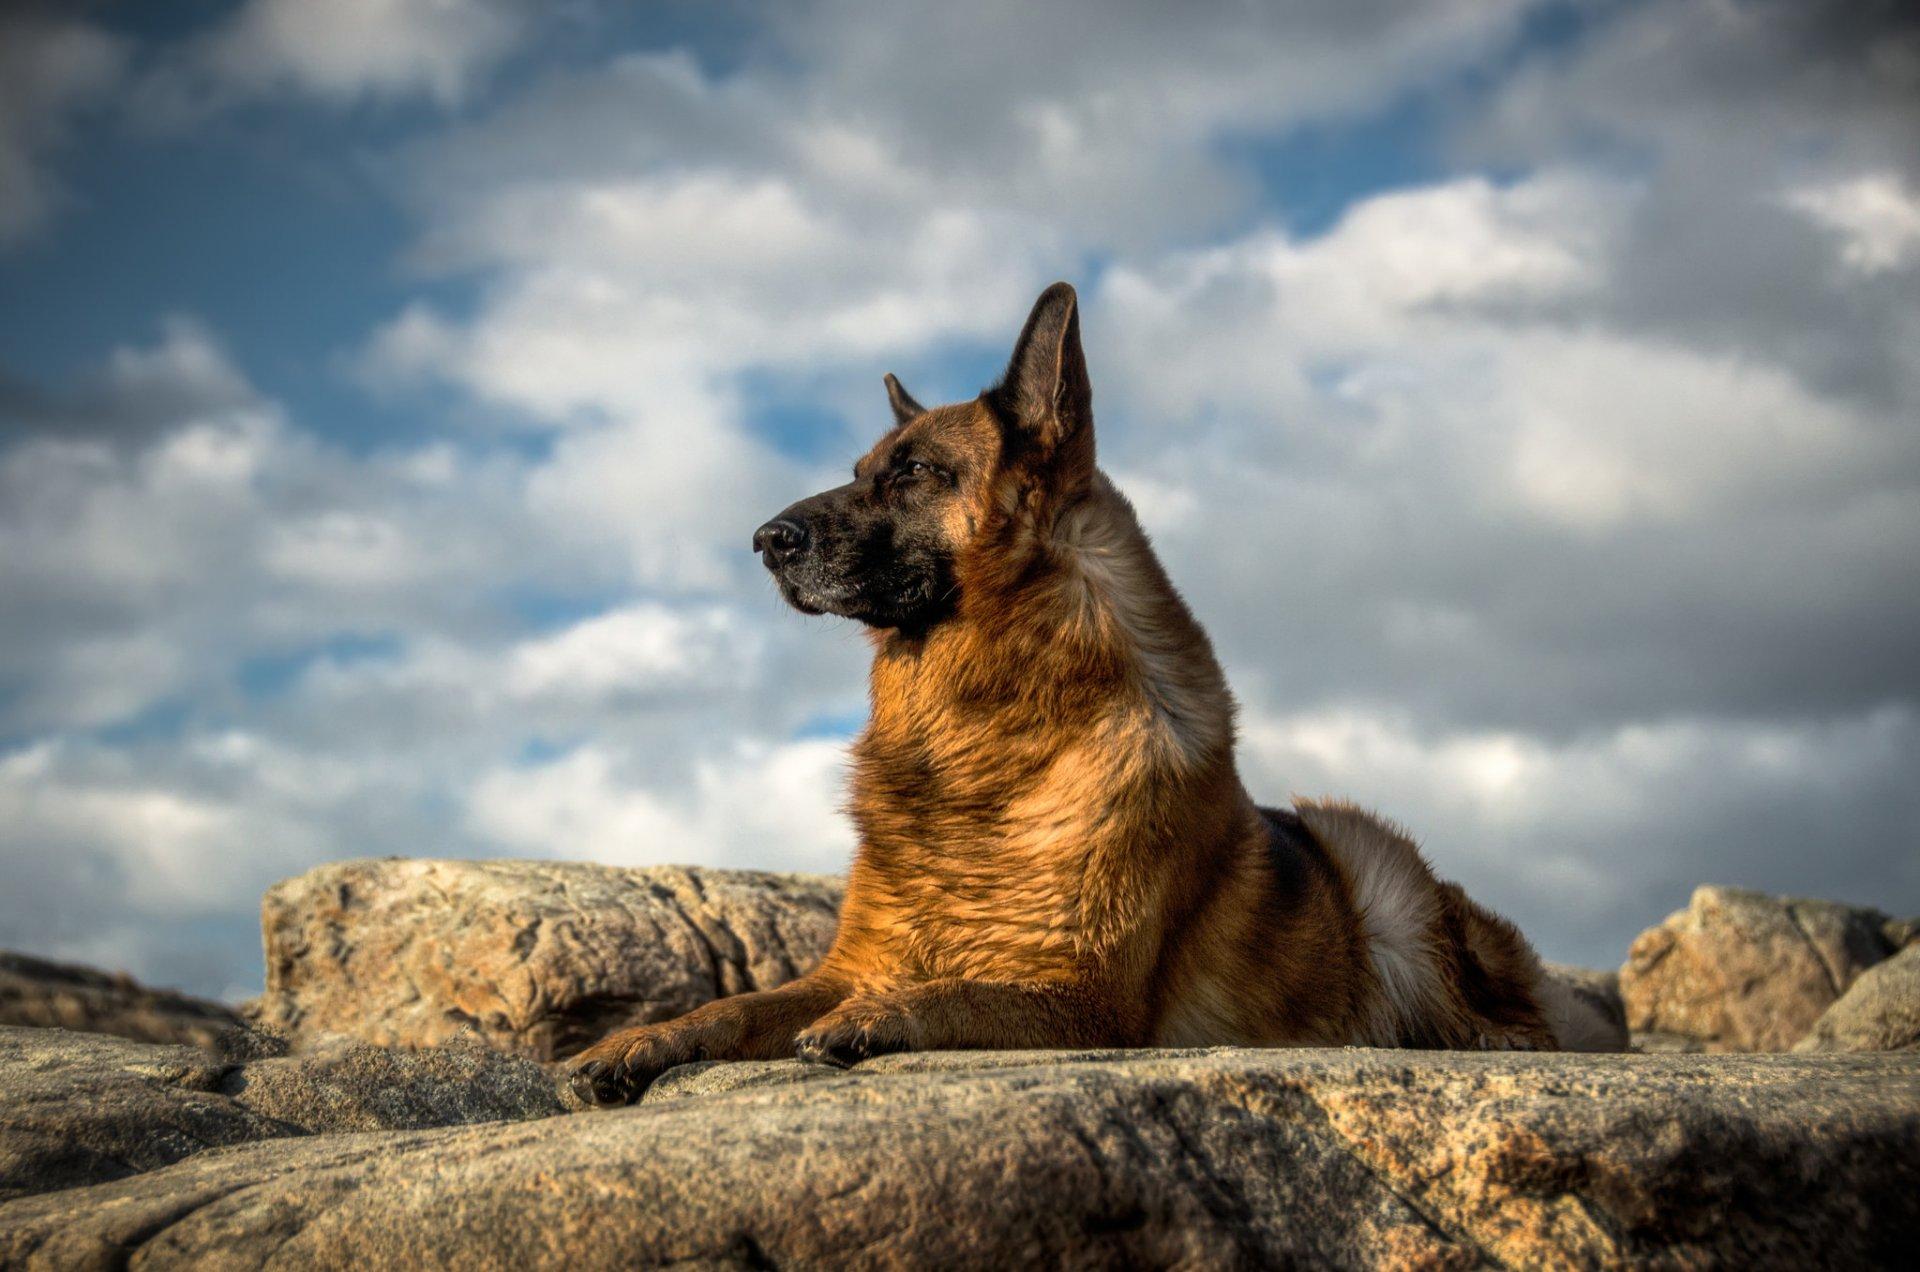 немецкая овчарка собака взгляд HD обои для ноутбука